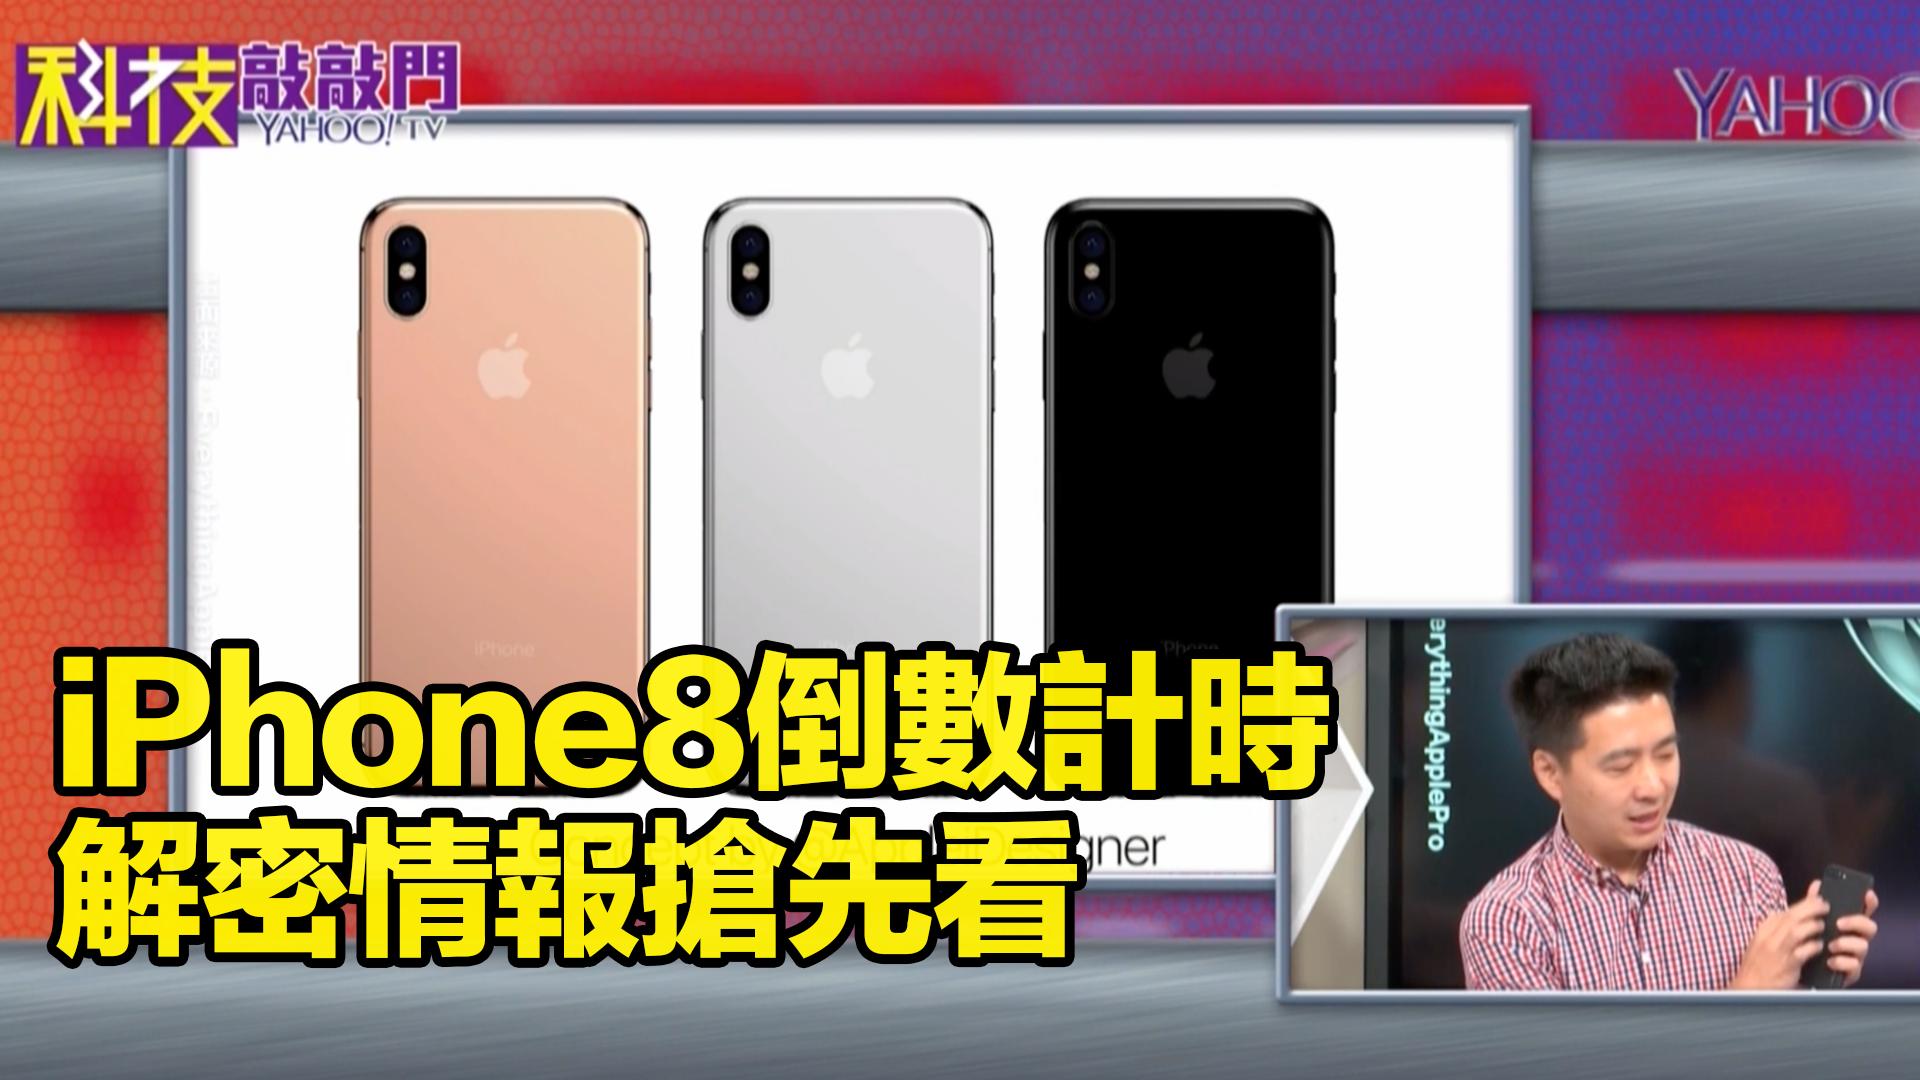 iPhone8倒數計時 解密情報搶先看(科技敲敲門)